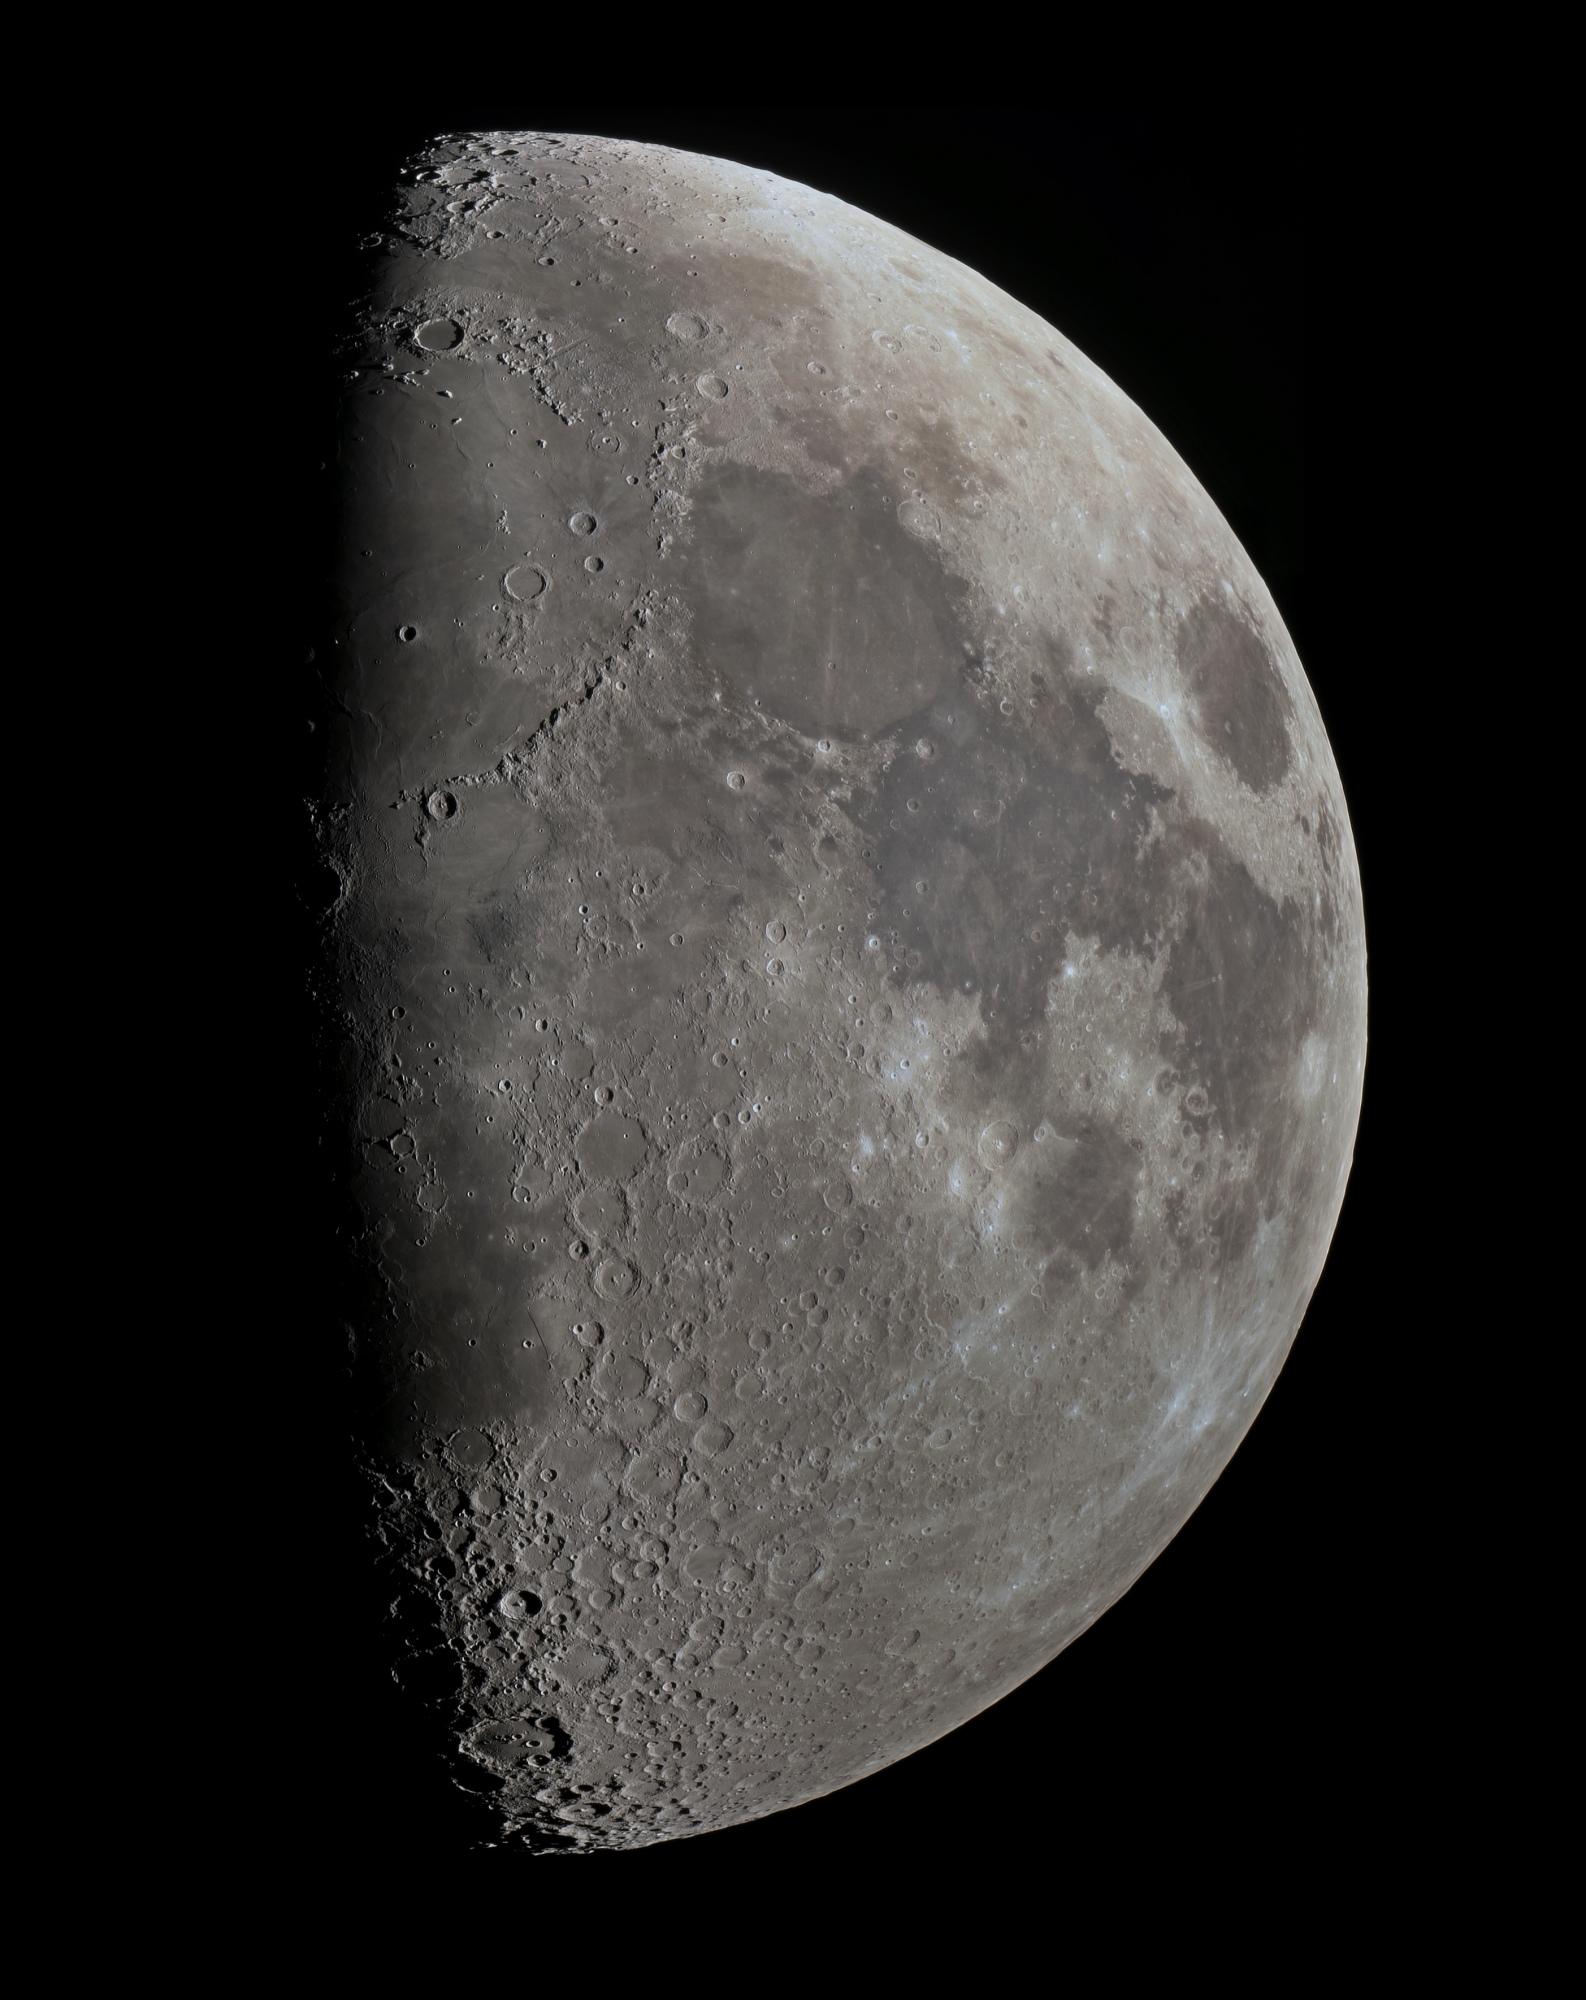 lune_normal.thumb.jpg.8d9332cadc51f3ed5480f55bca2a11e0.jpg